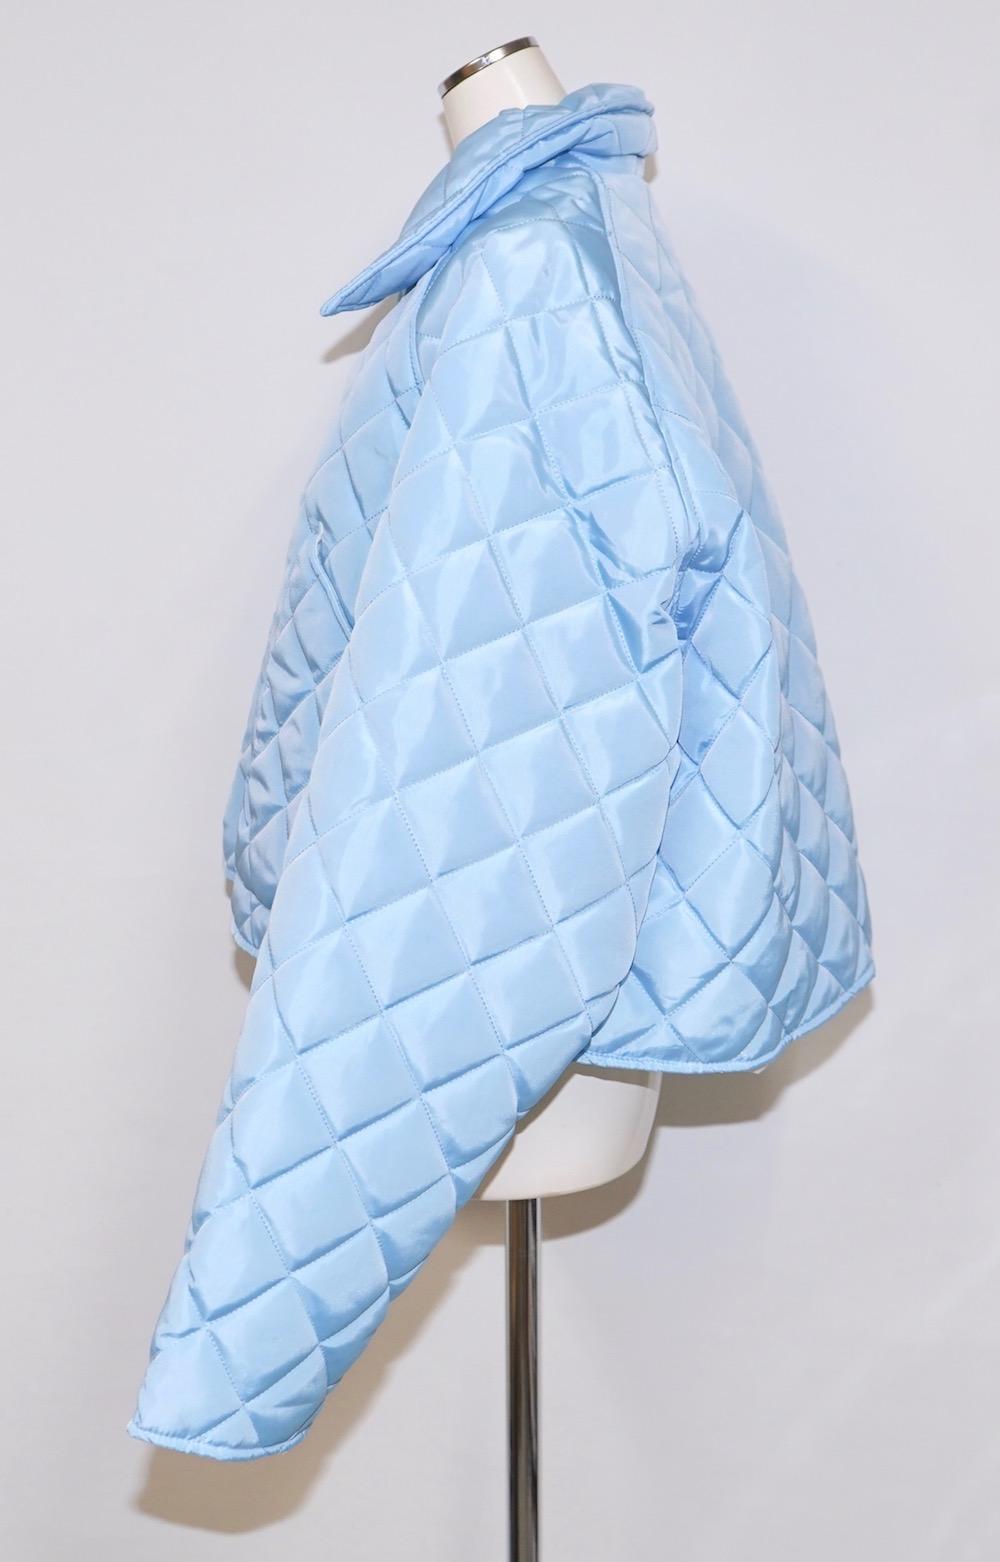 Padding Quilting Jacket (light blue)